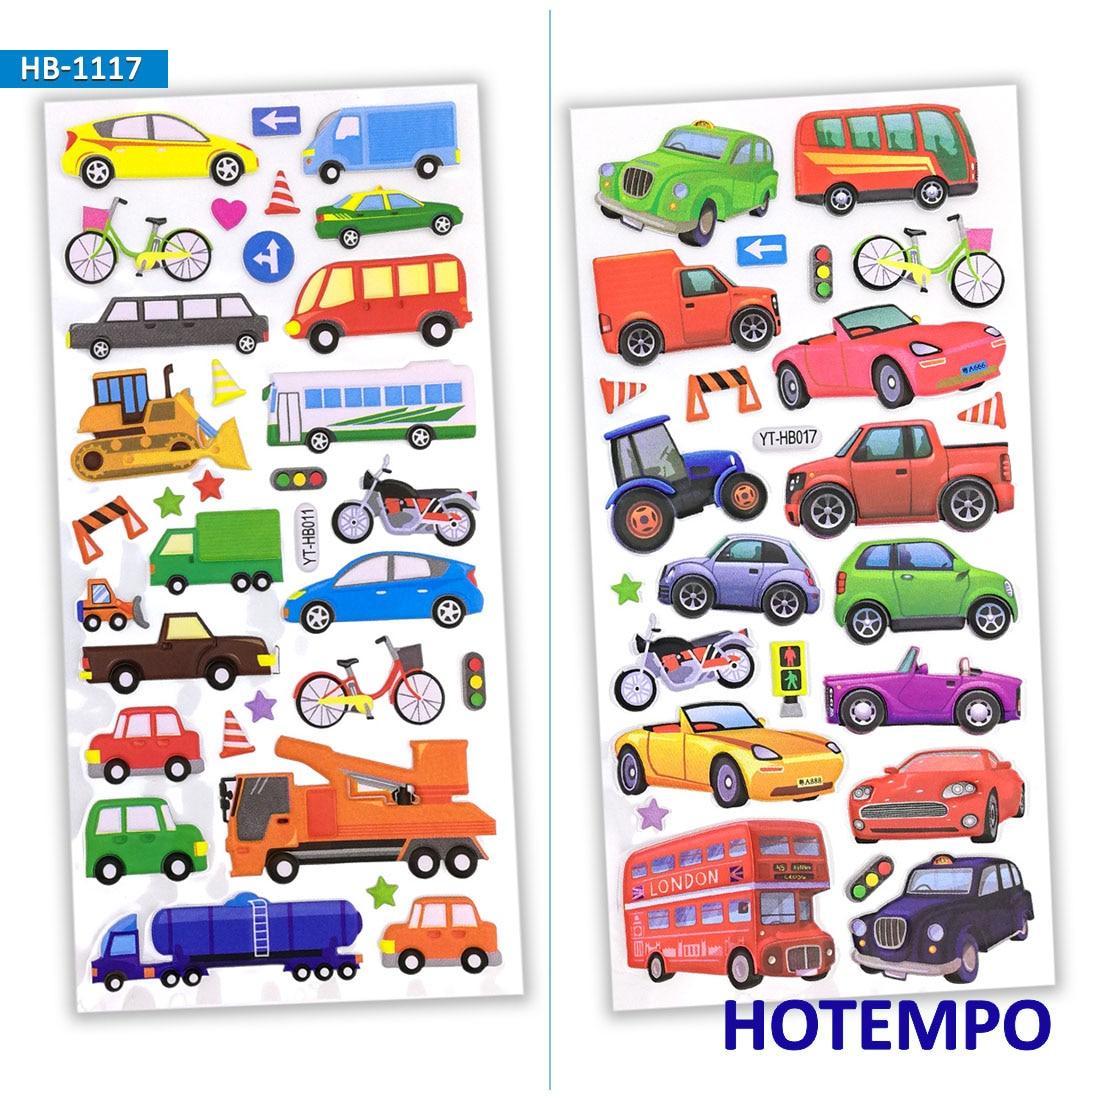 3D Foam Cute Cartoon Color Car Truck Airplane Wild Marine Animal Dinosaur Zoo Kids Stickers Pack For DIY Gift Scrapbook Stickers